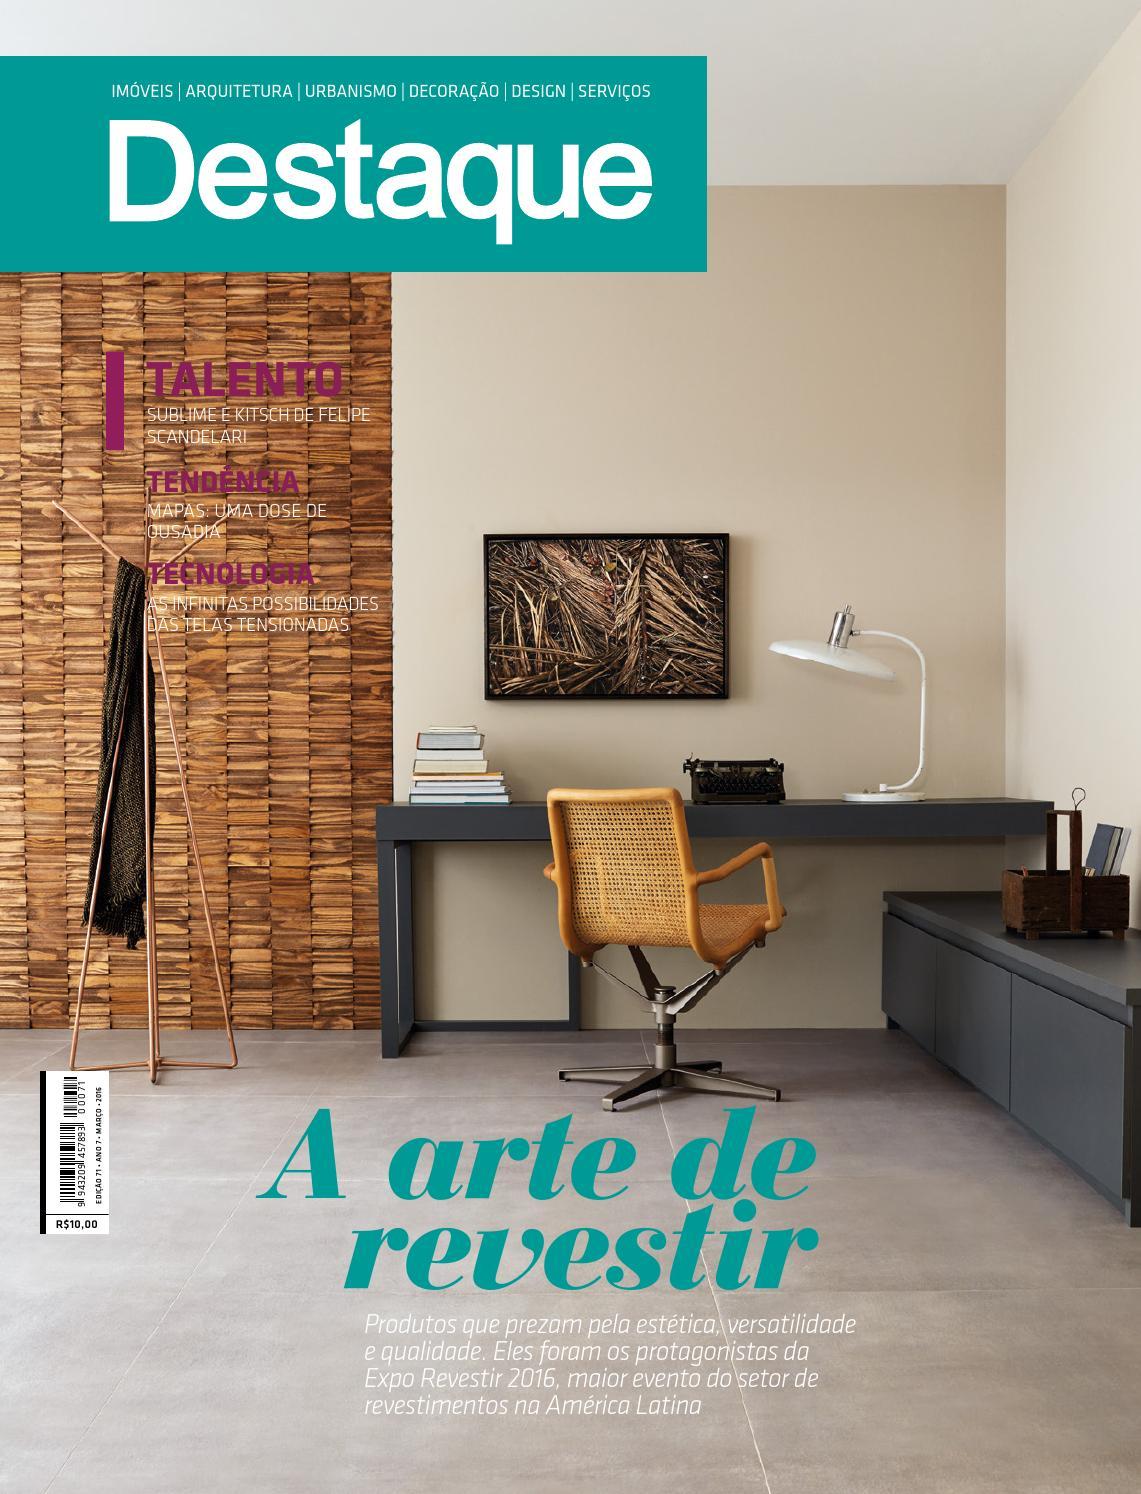 fb061c6dd751d Revista Destaque Março 2016 by Revista Destaque Decor - issuu